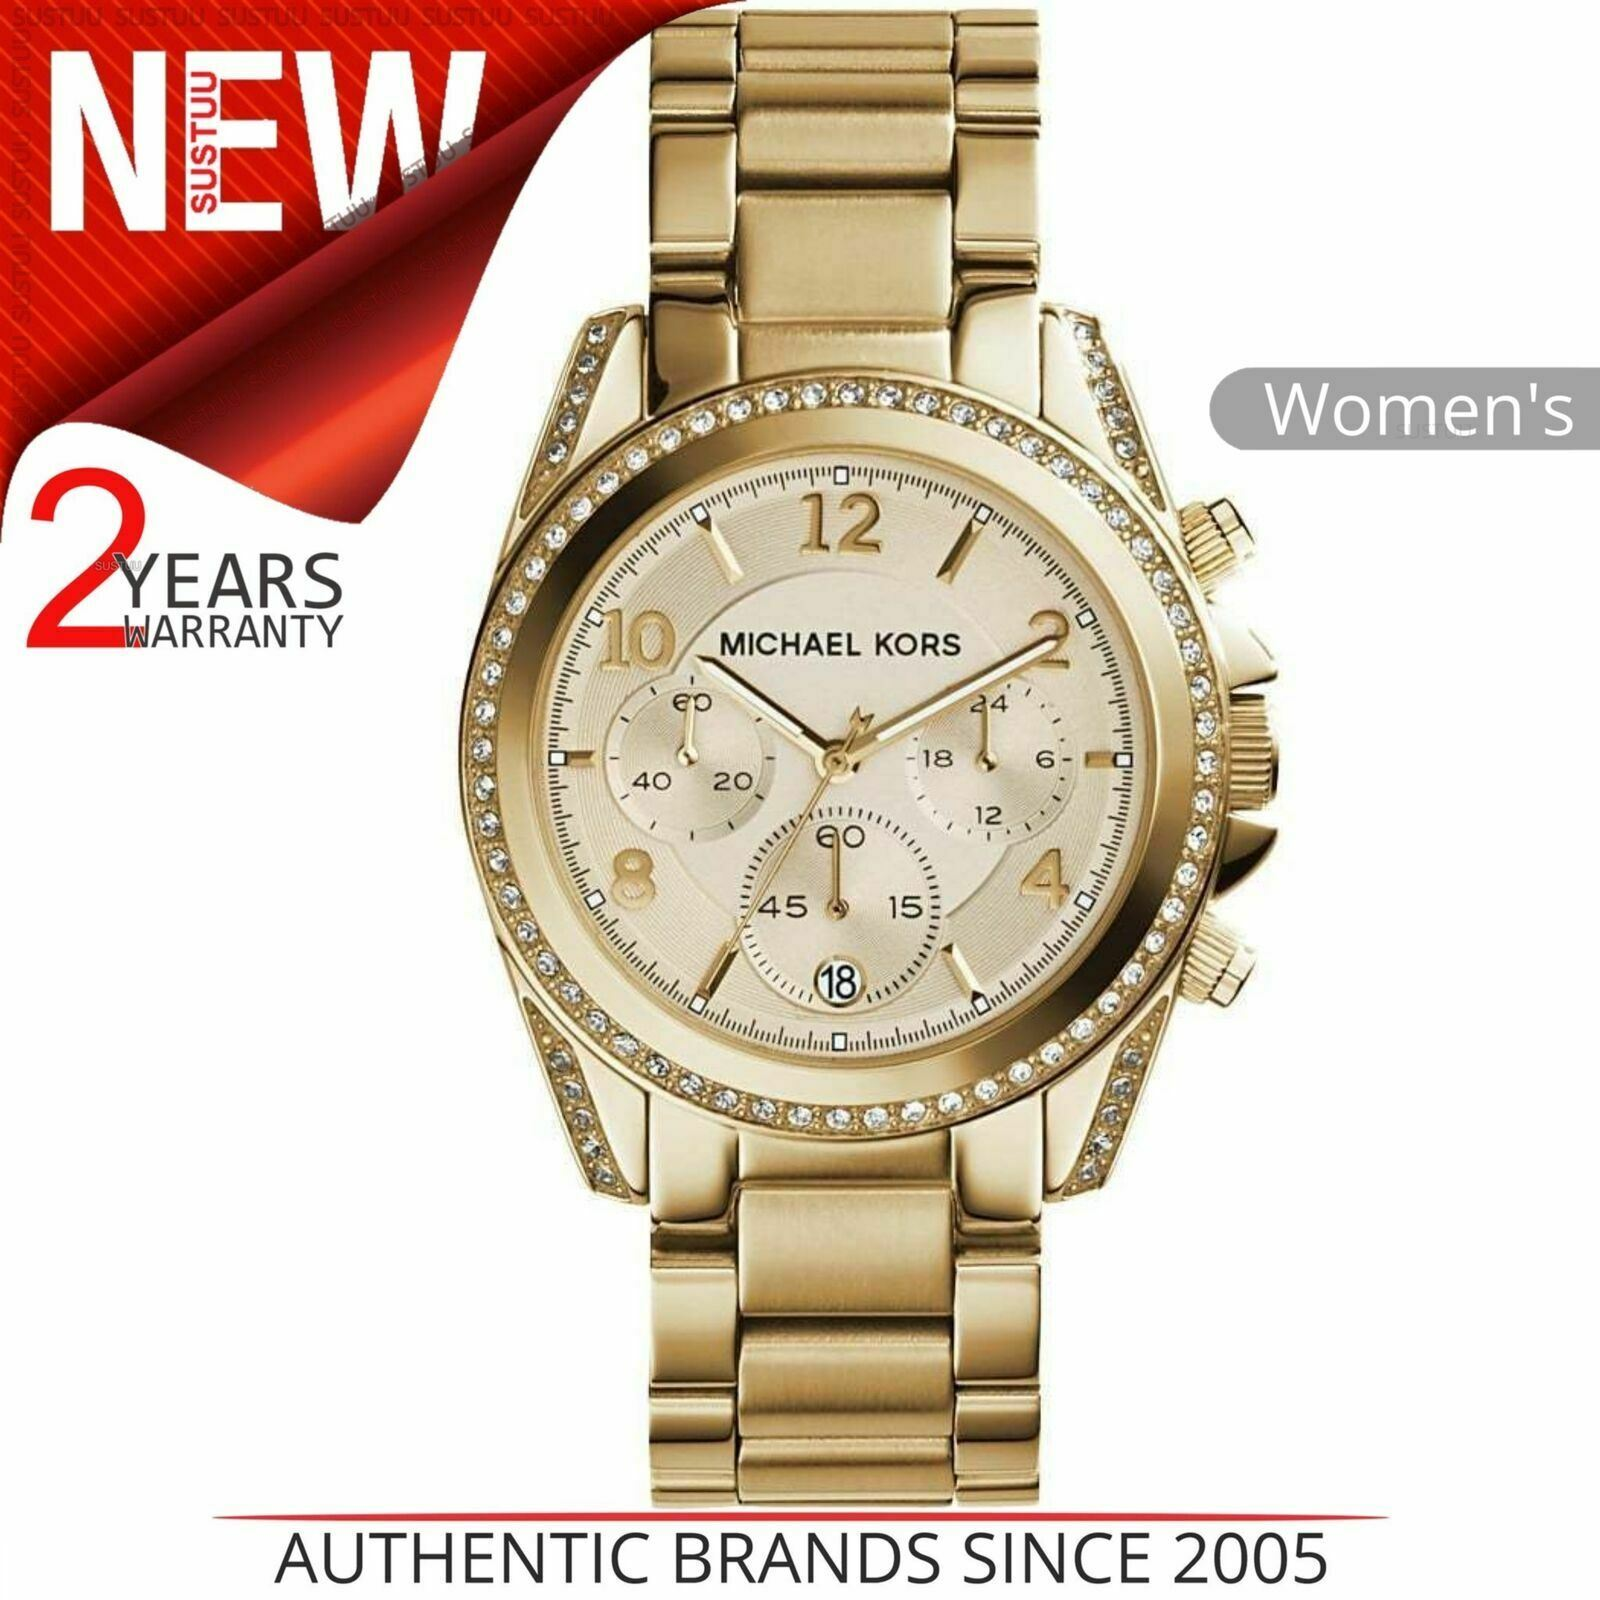 Details about Michael Kors Blair Ladies' Watch MK5166│Chronograph Dial│Gold Tone Bracelet Band